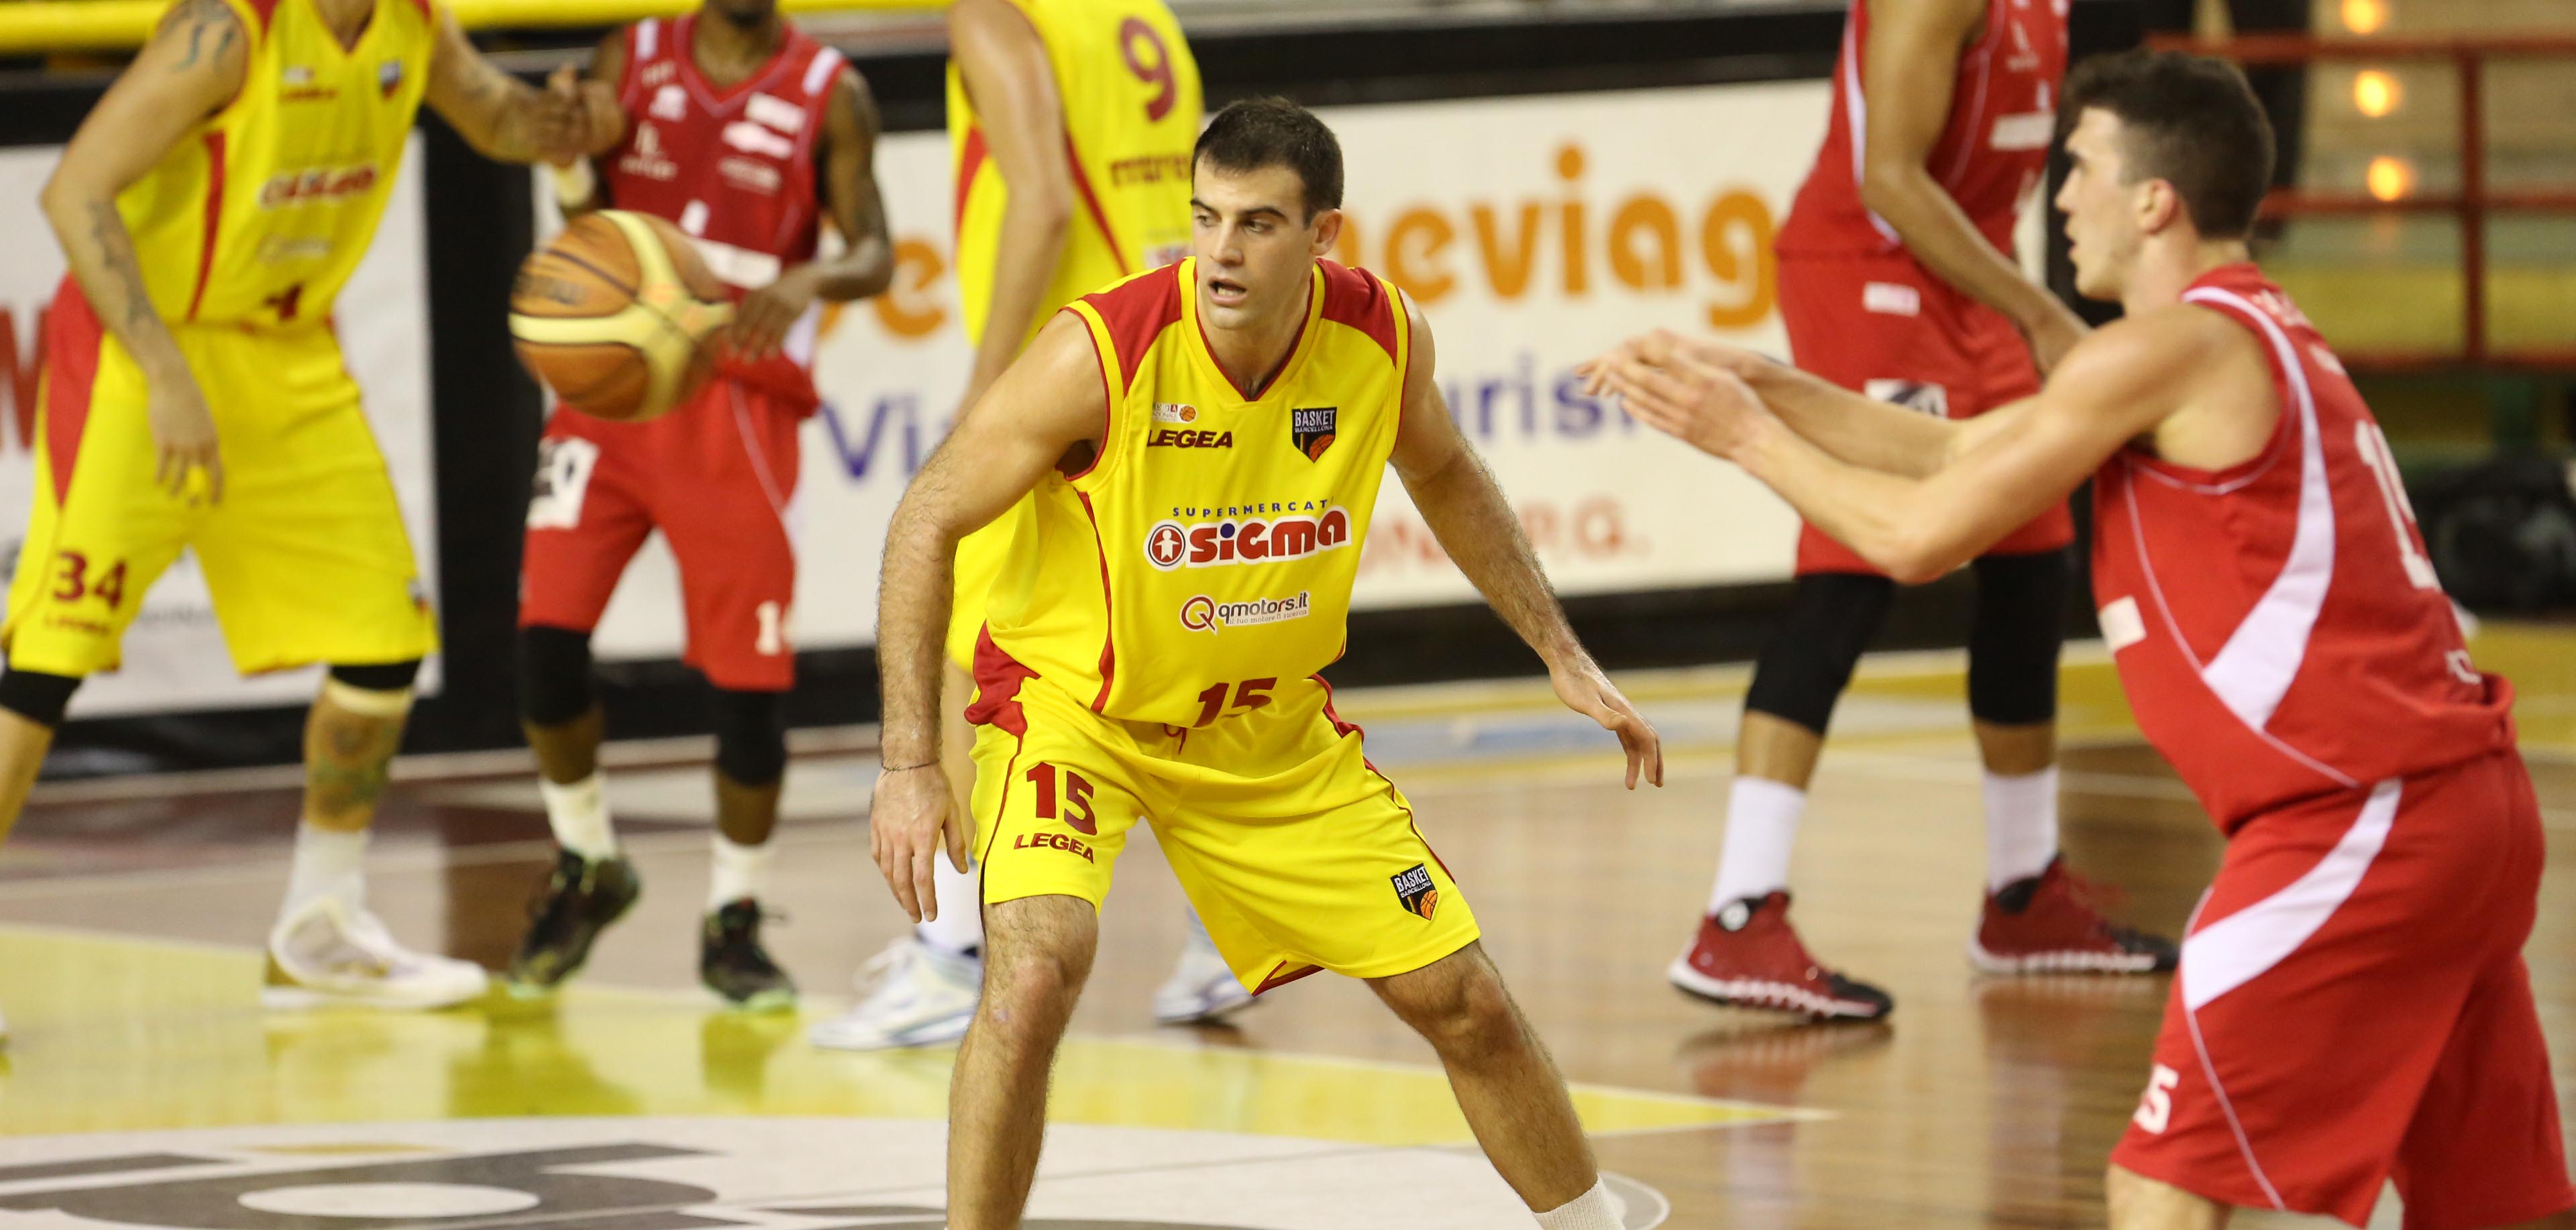 Mercato Azzurro Napoli Basket, da Barcellona arriva Gabriele Ganeto